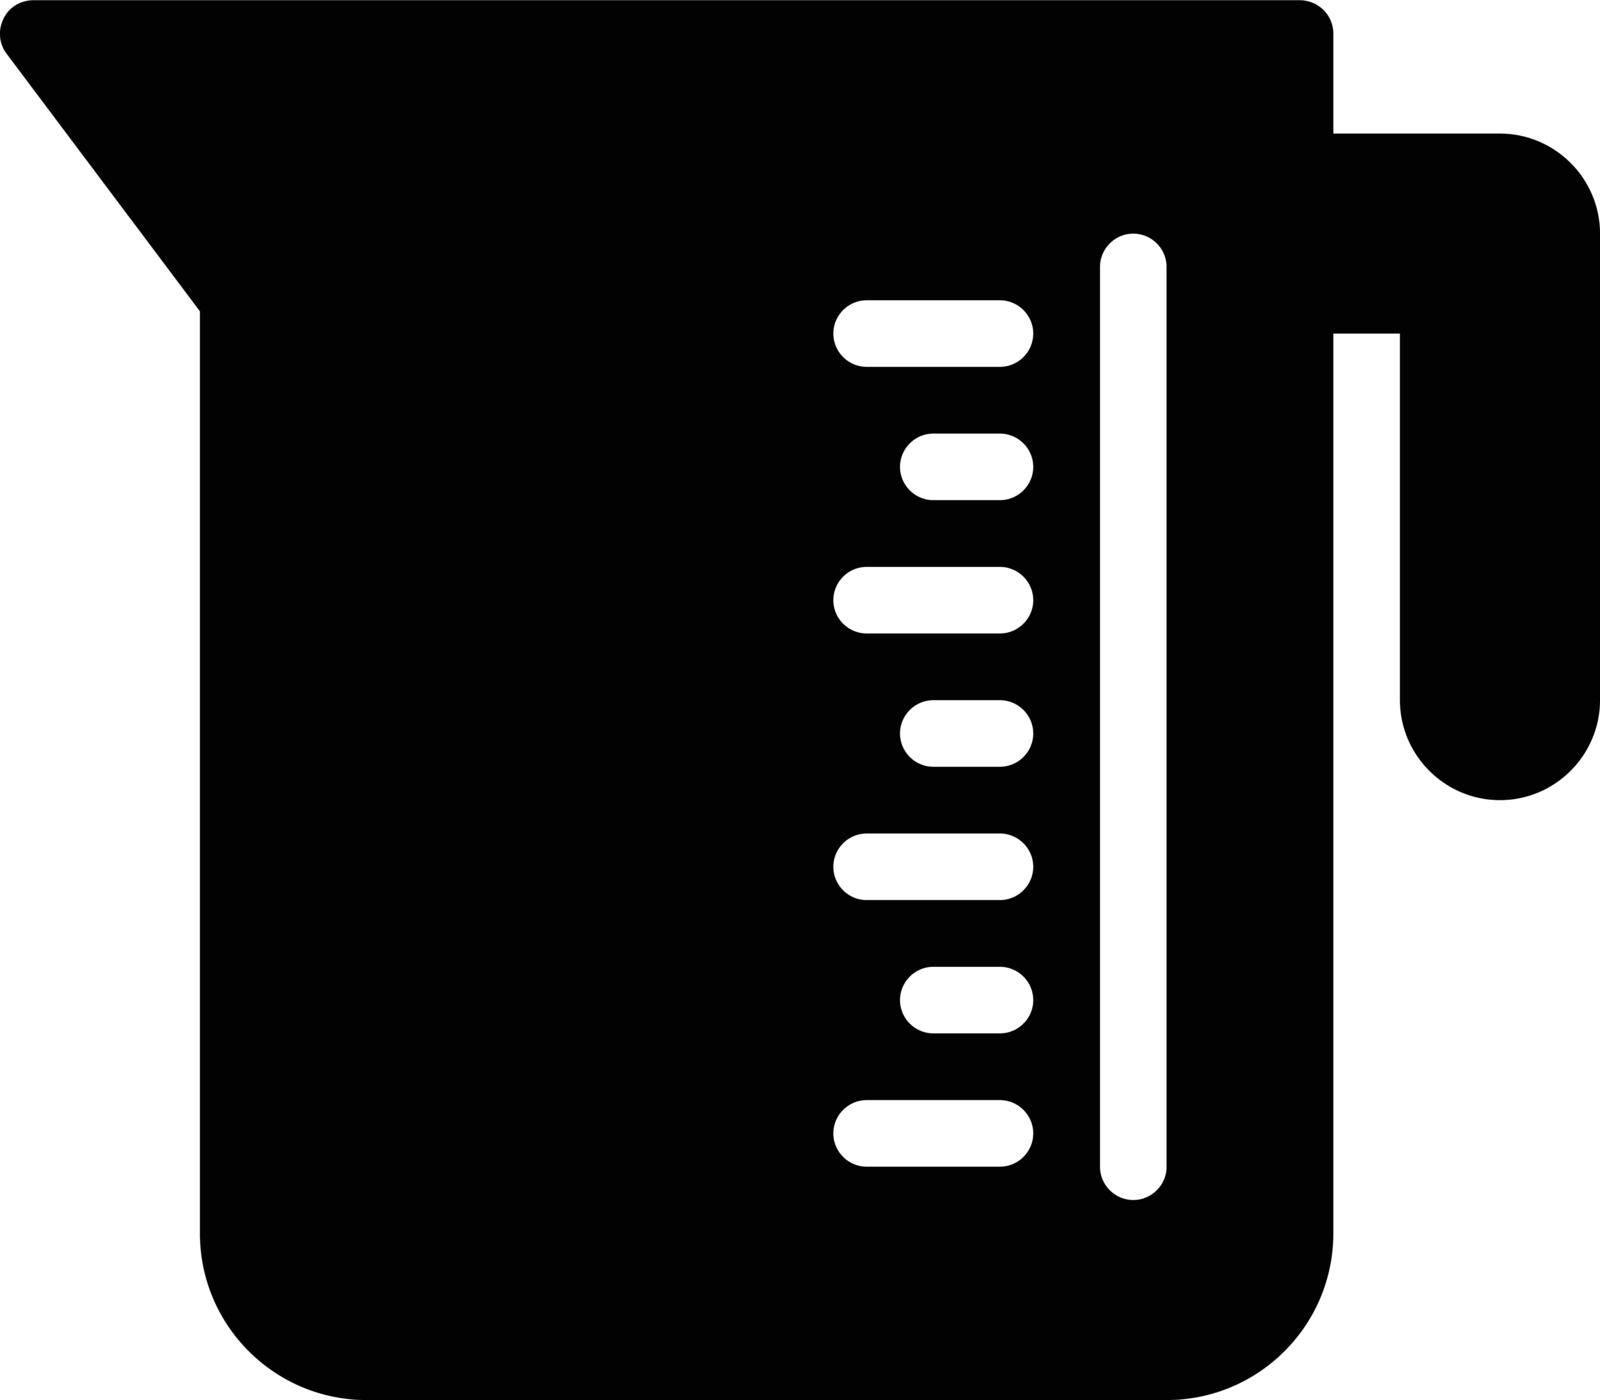 jug measurement vector glyph flat icon